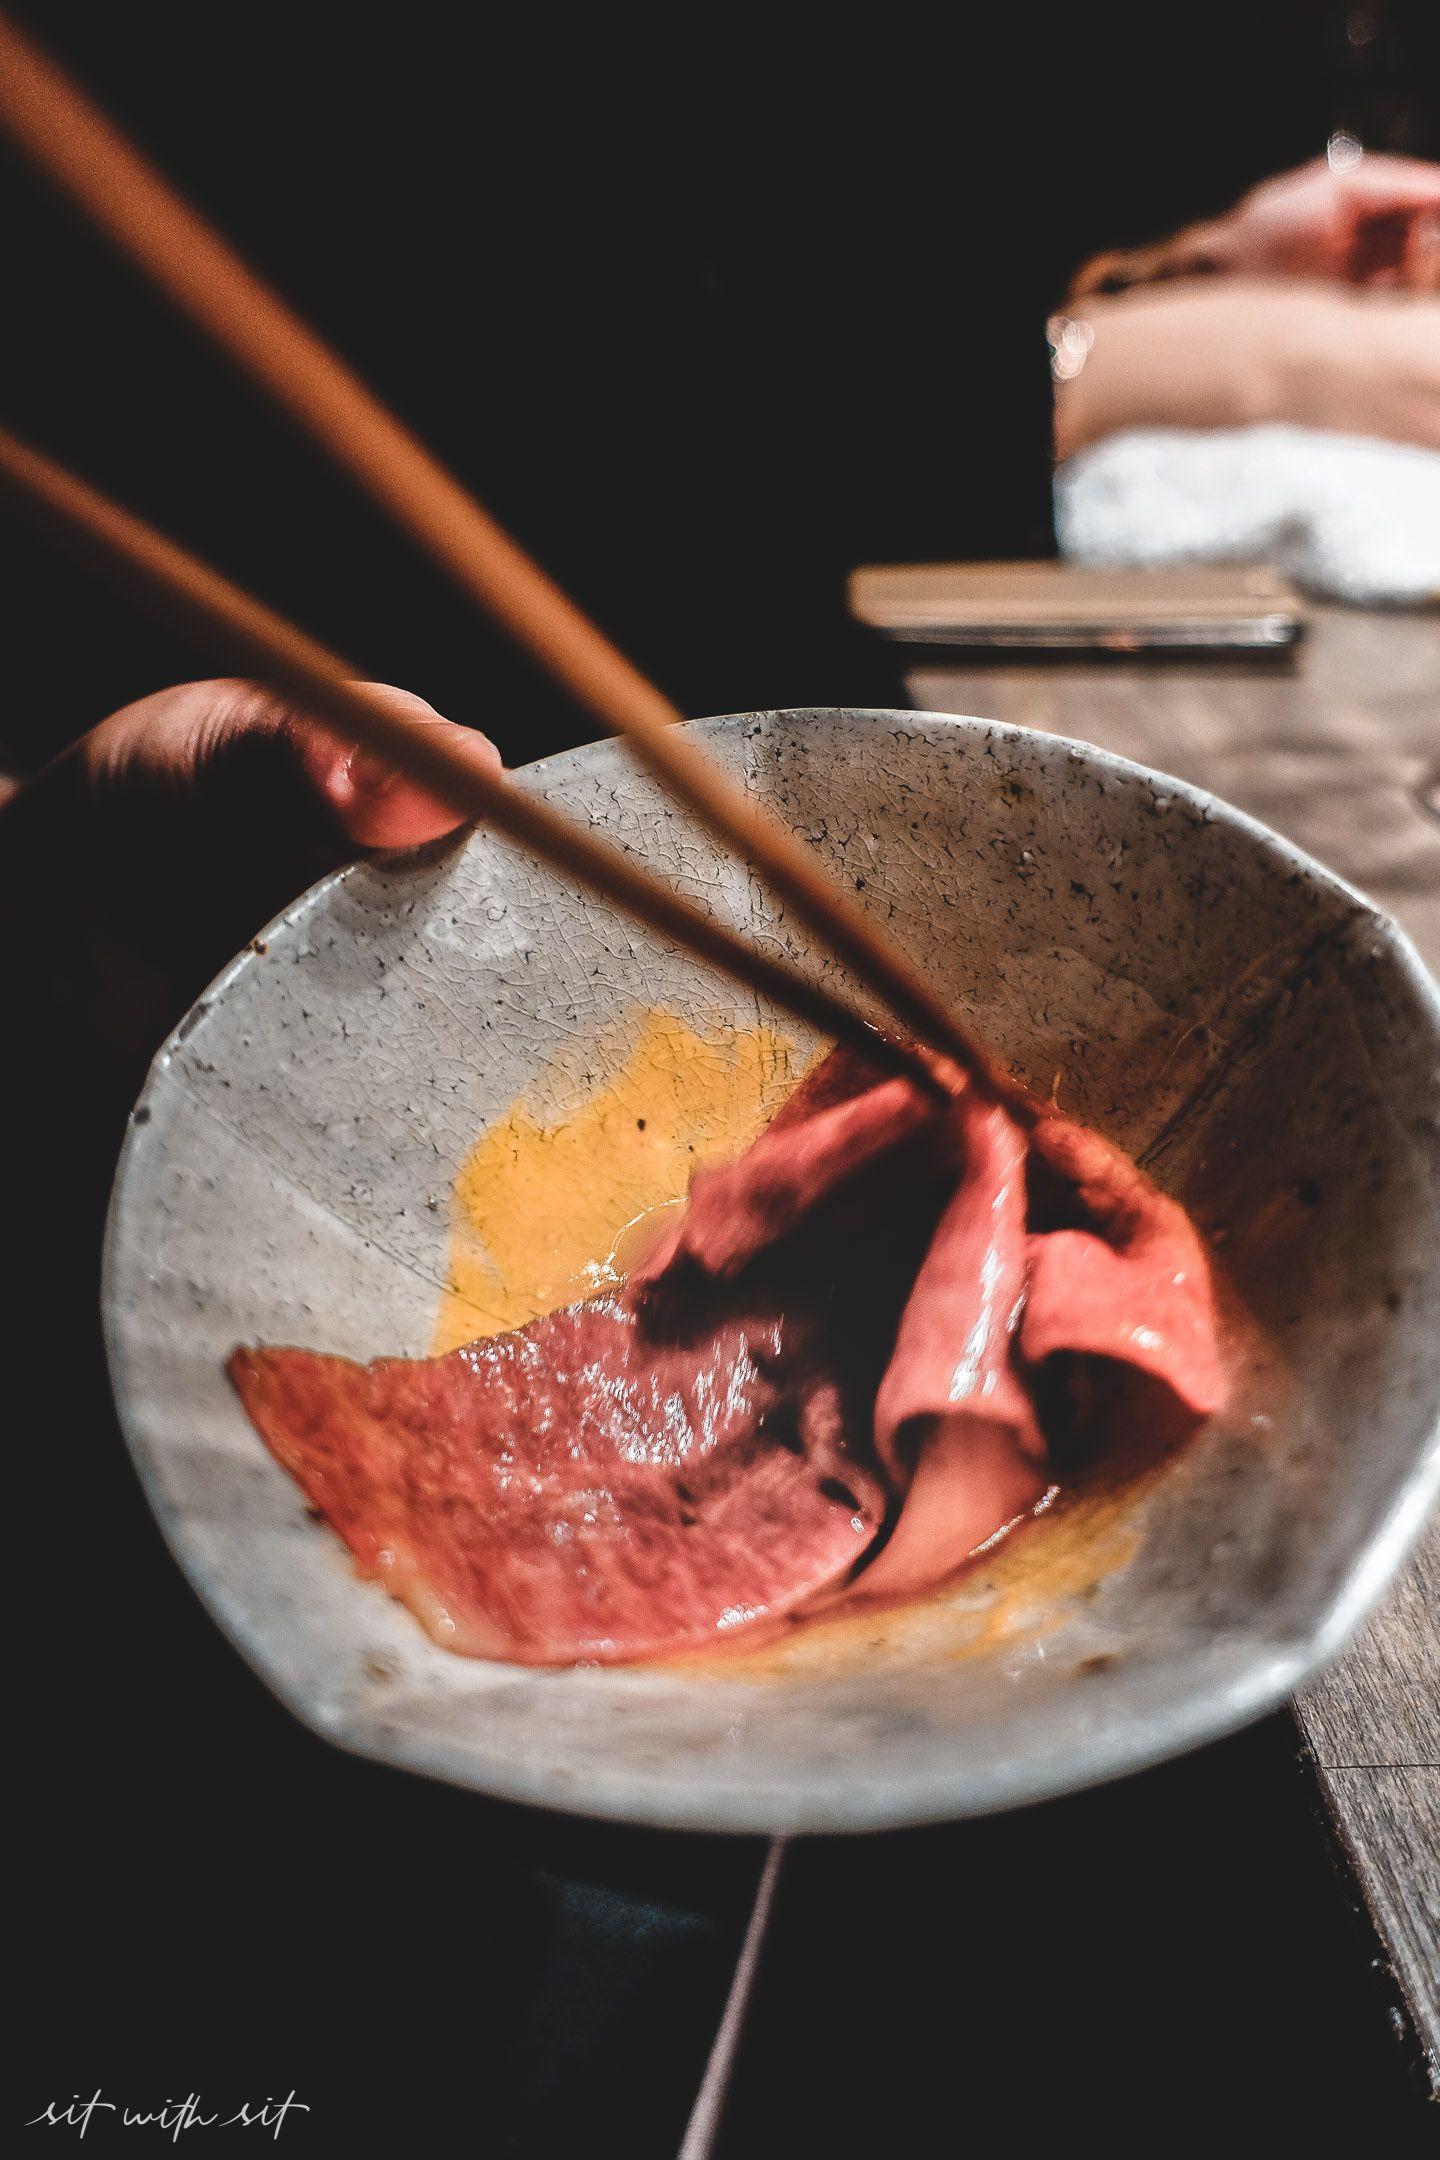 Ushigoros Sukiyaki Beef Sushi Marbled Beef Homemade Vanilla Ice Cream